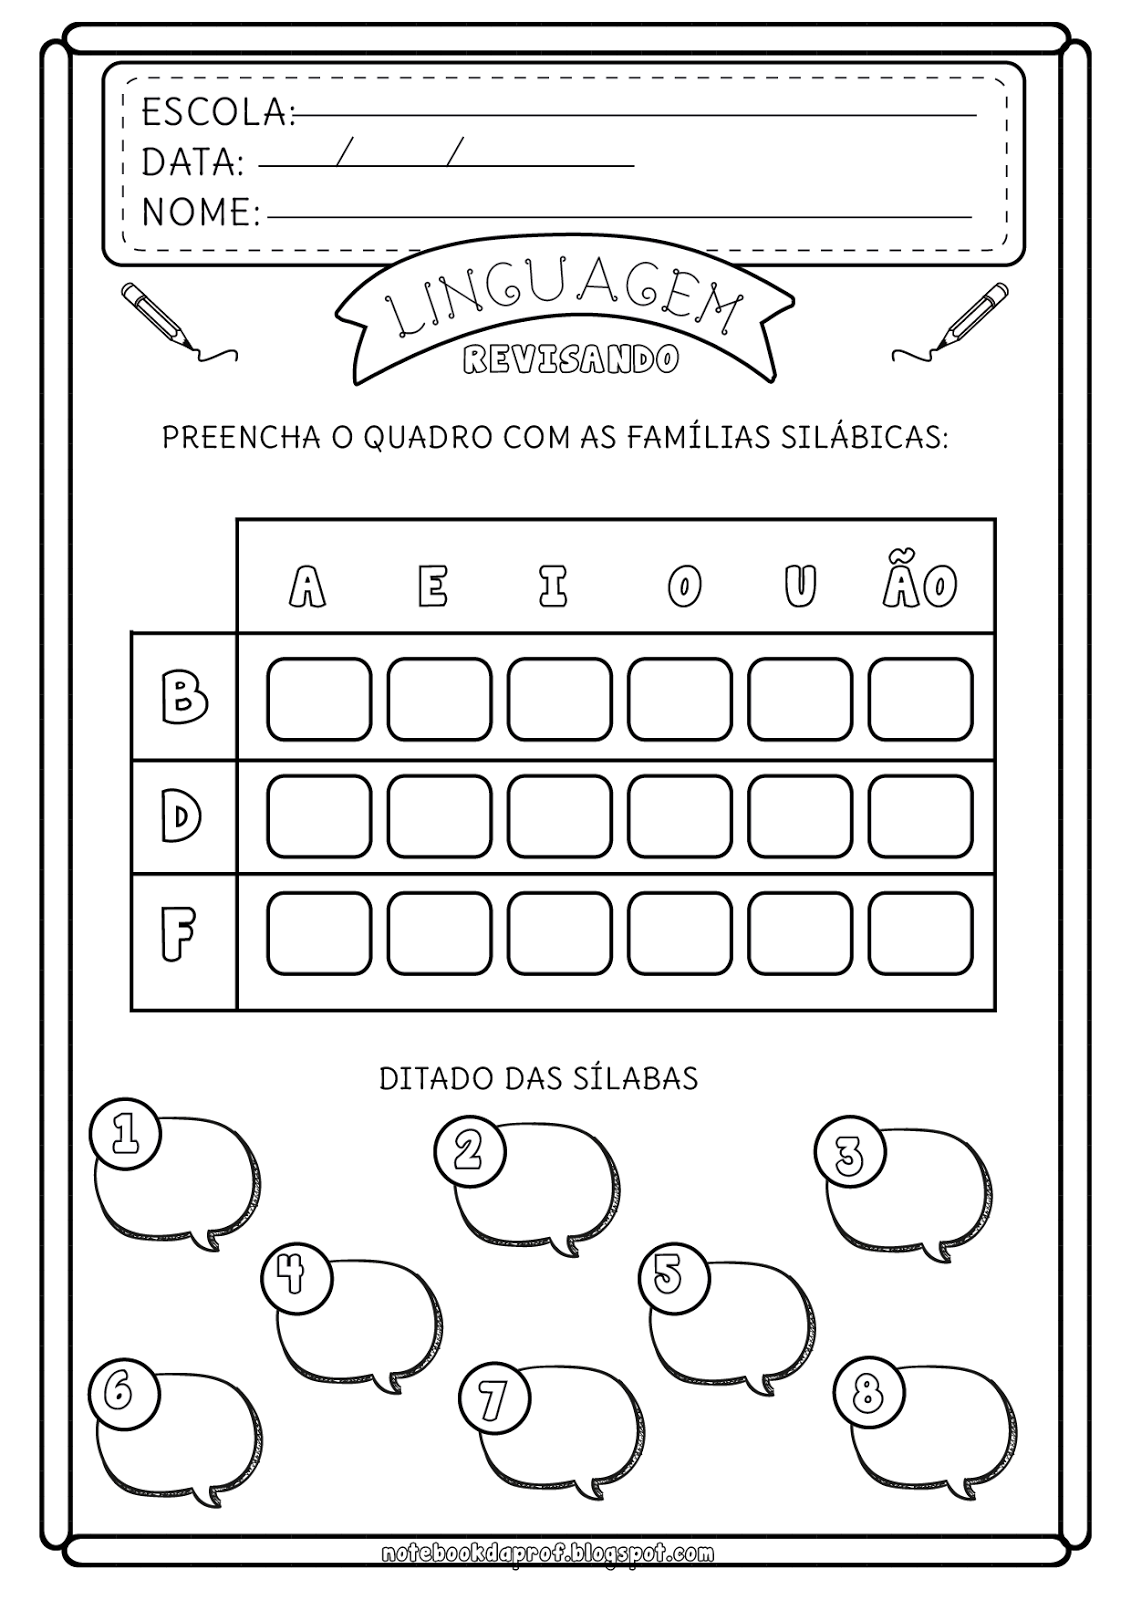 Notebook Da Profa Atividades Revisao